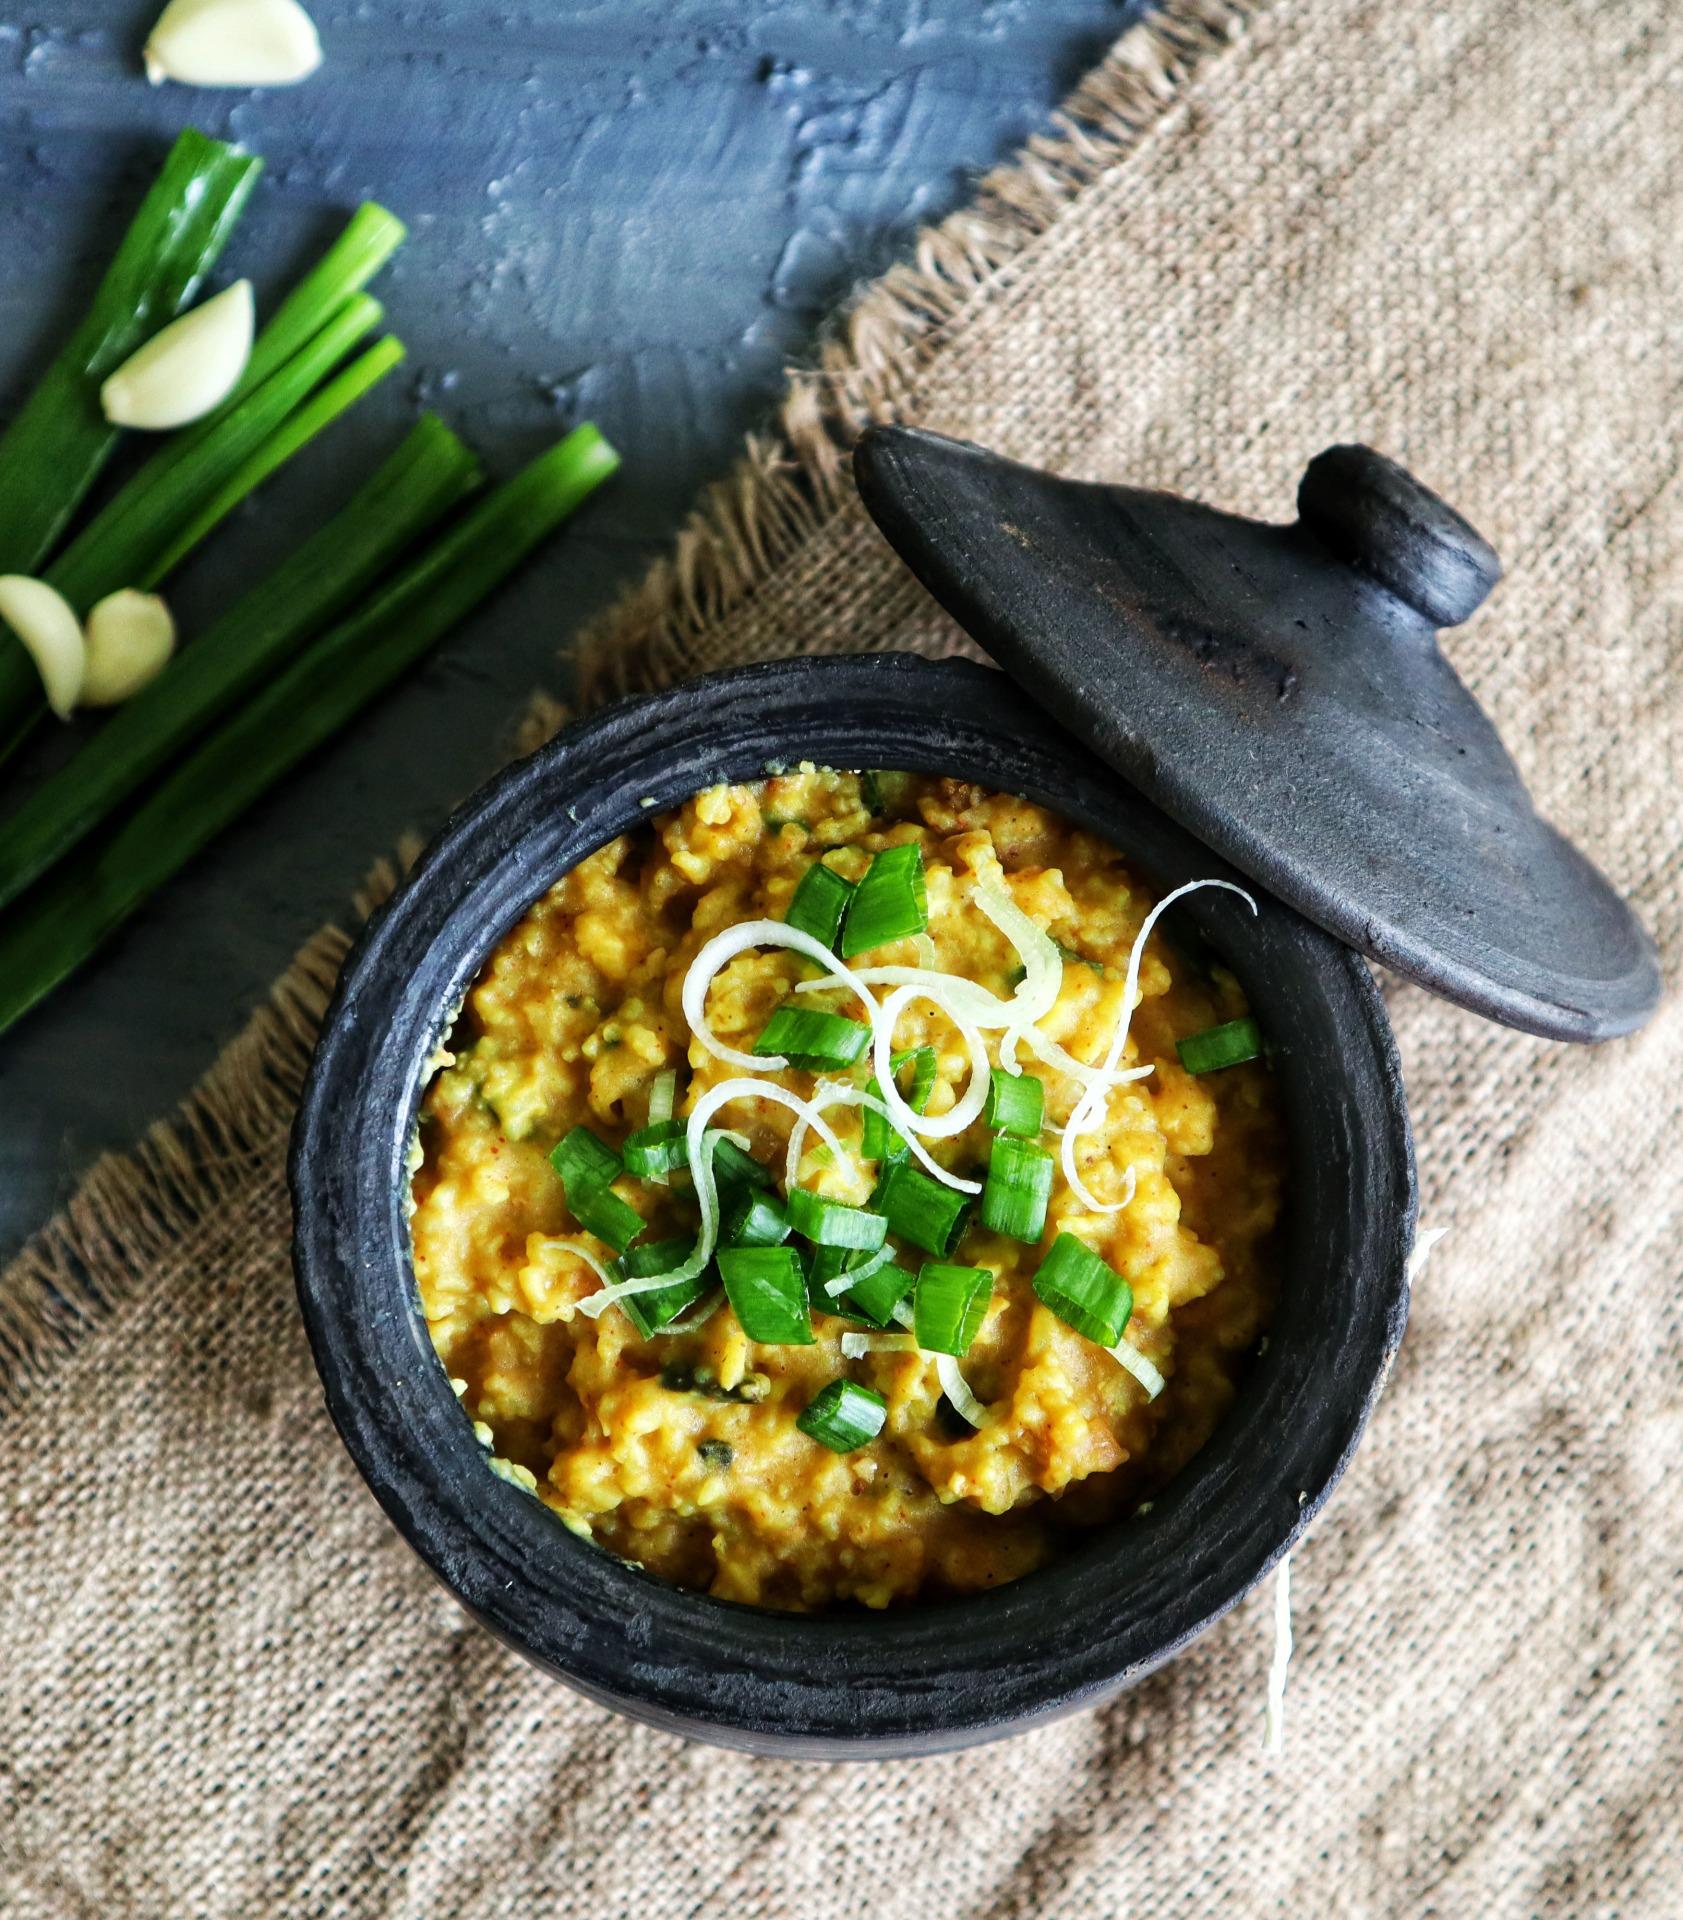 Harepyaaz ki lehsuni khichdi-spring onion kedgeree   Copyright Image   From The Corner Table